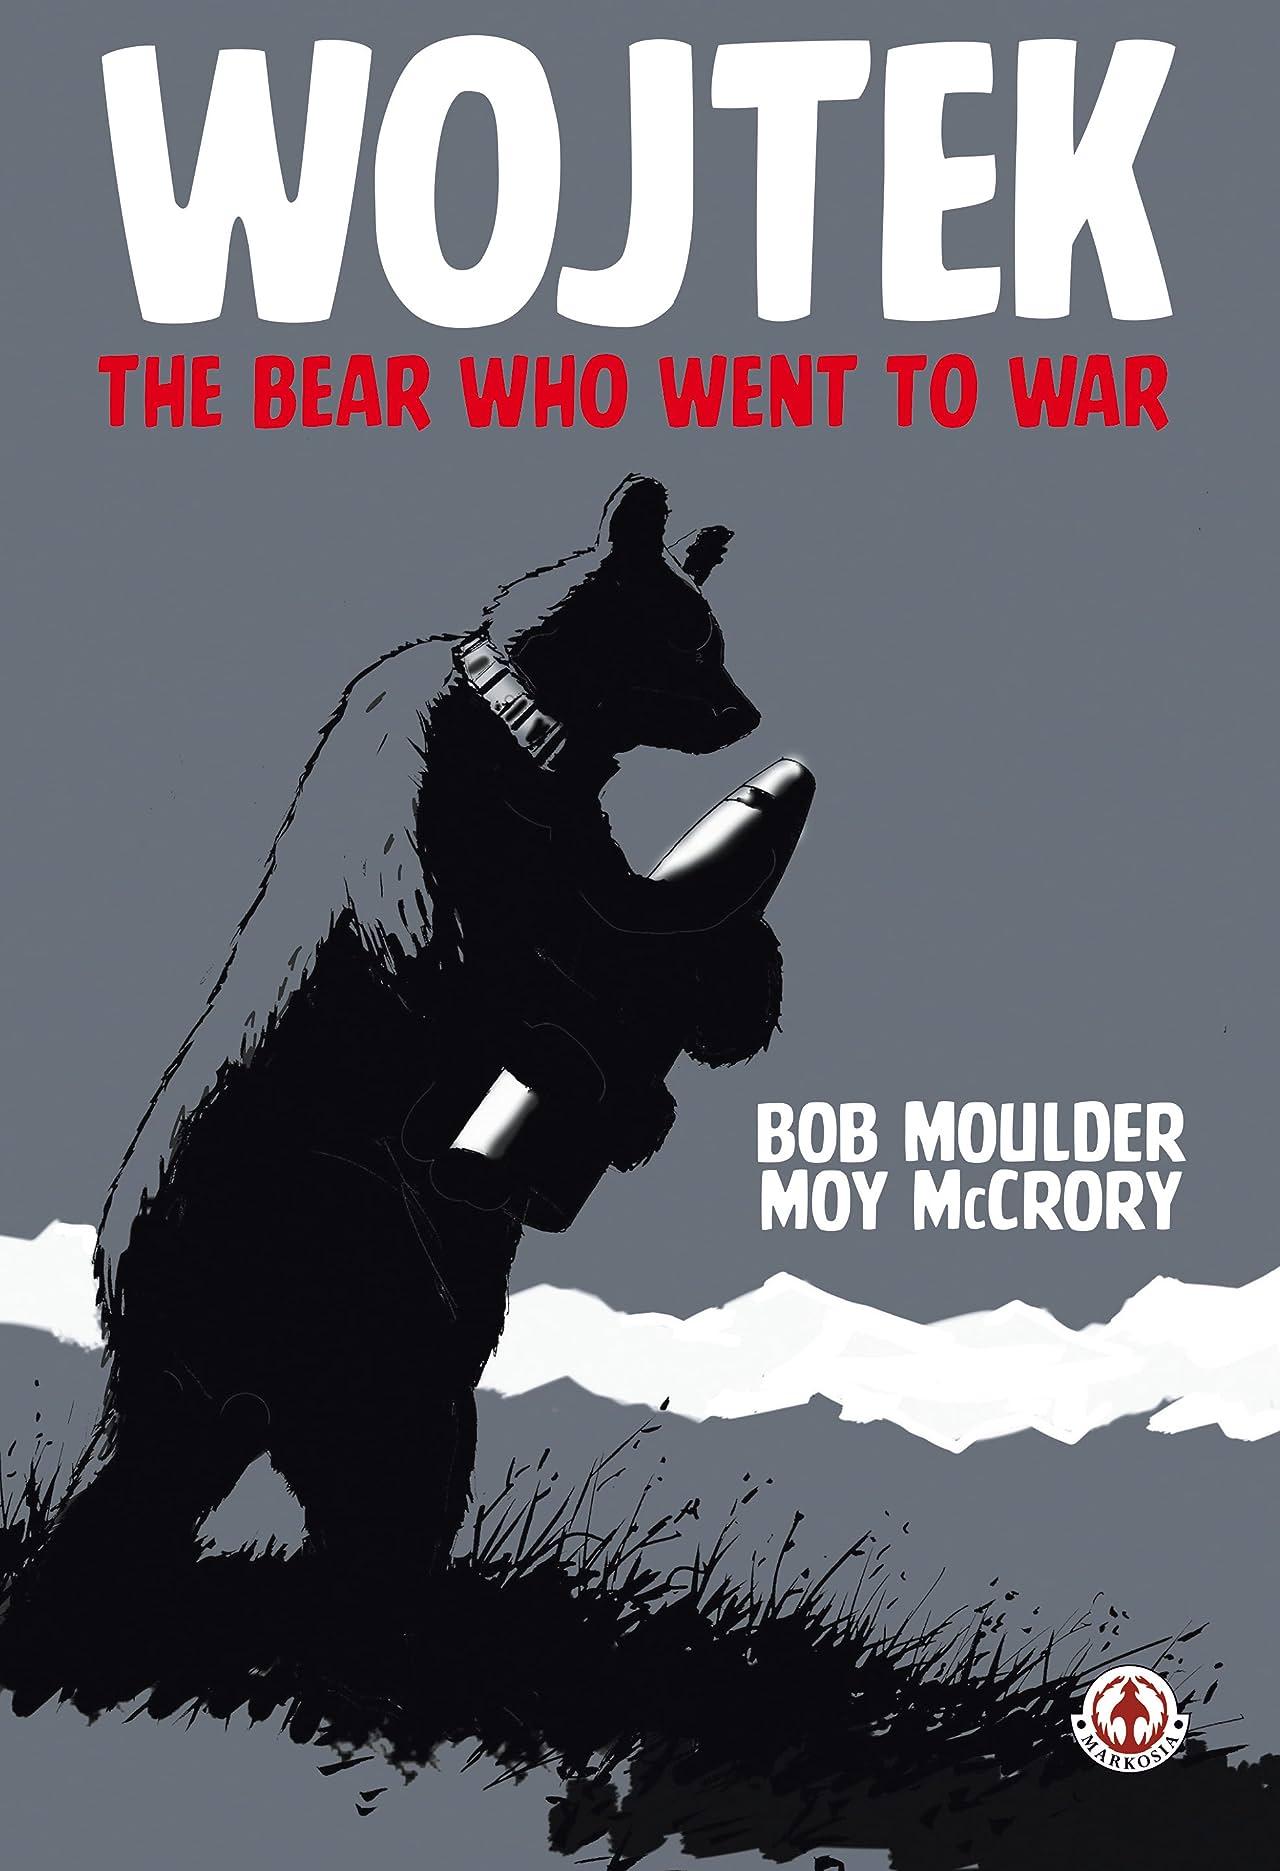 Wojtek: The bear who went to war